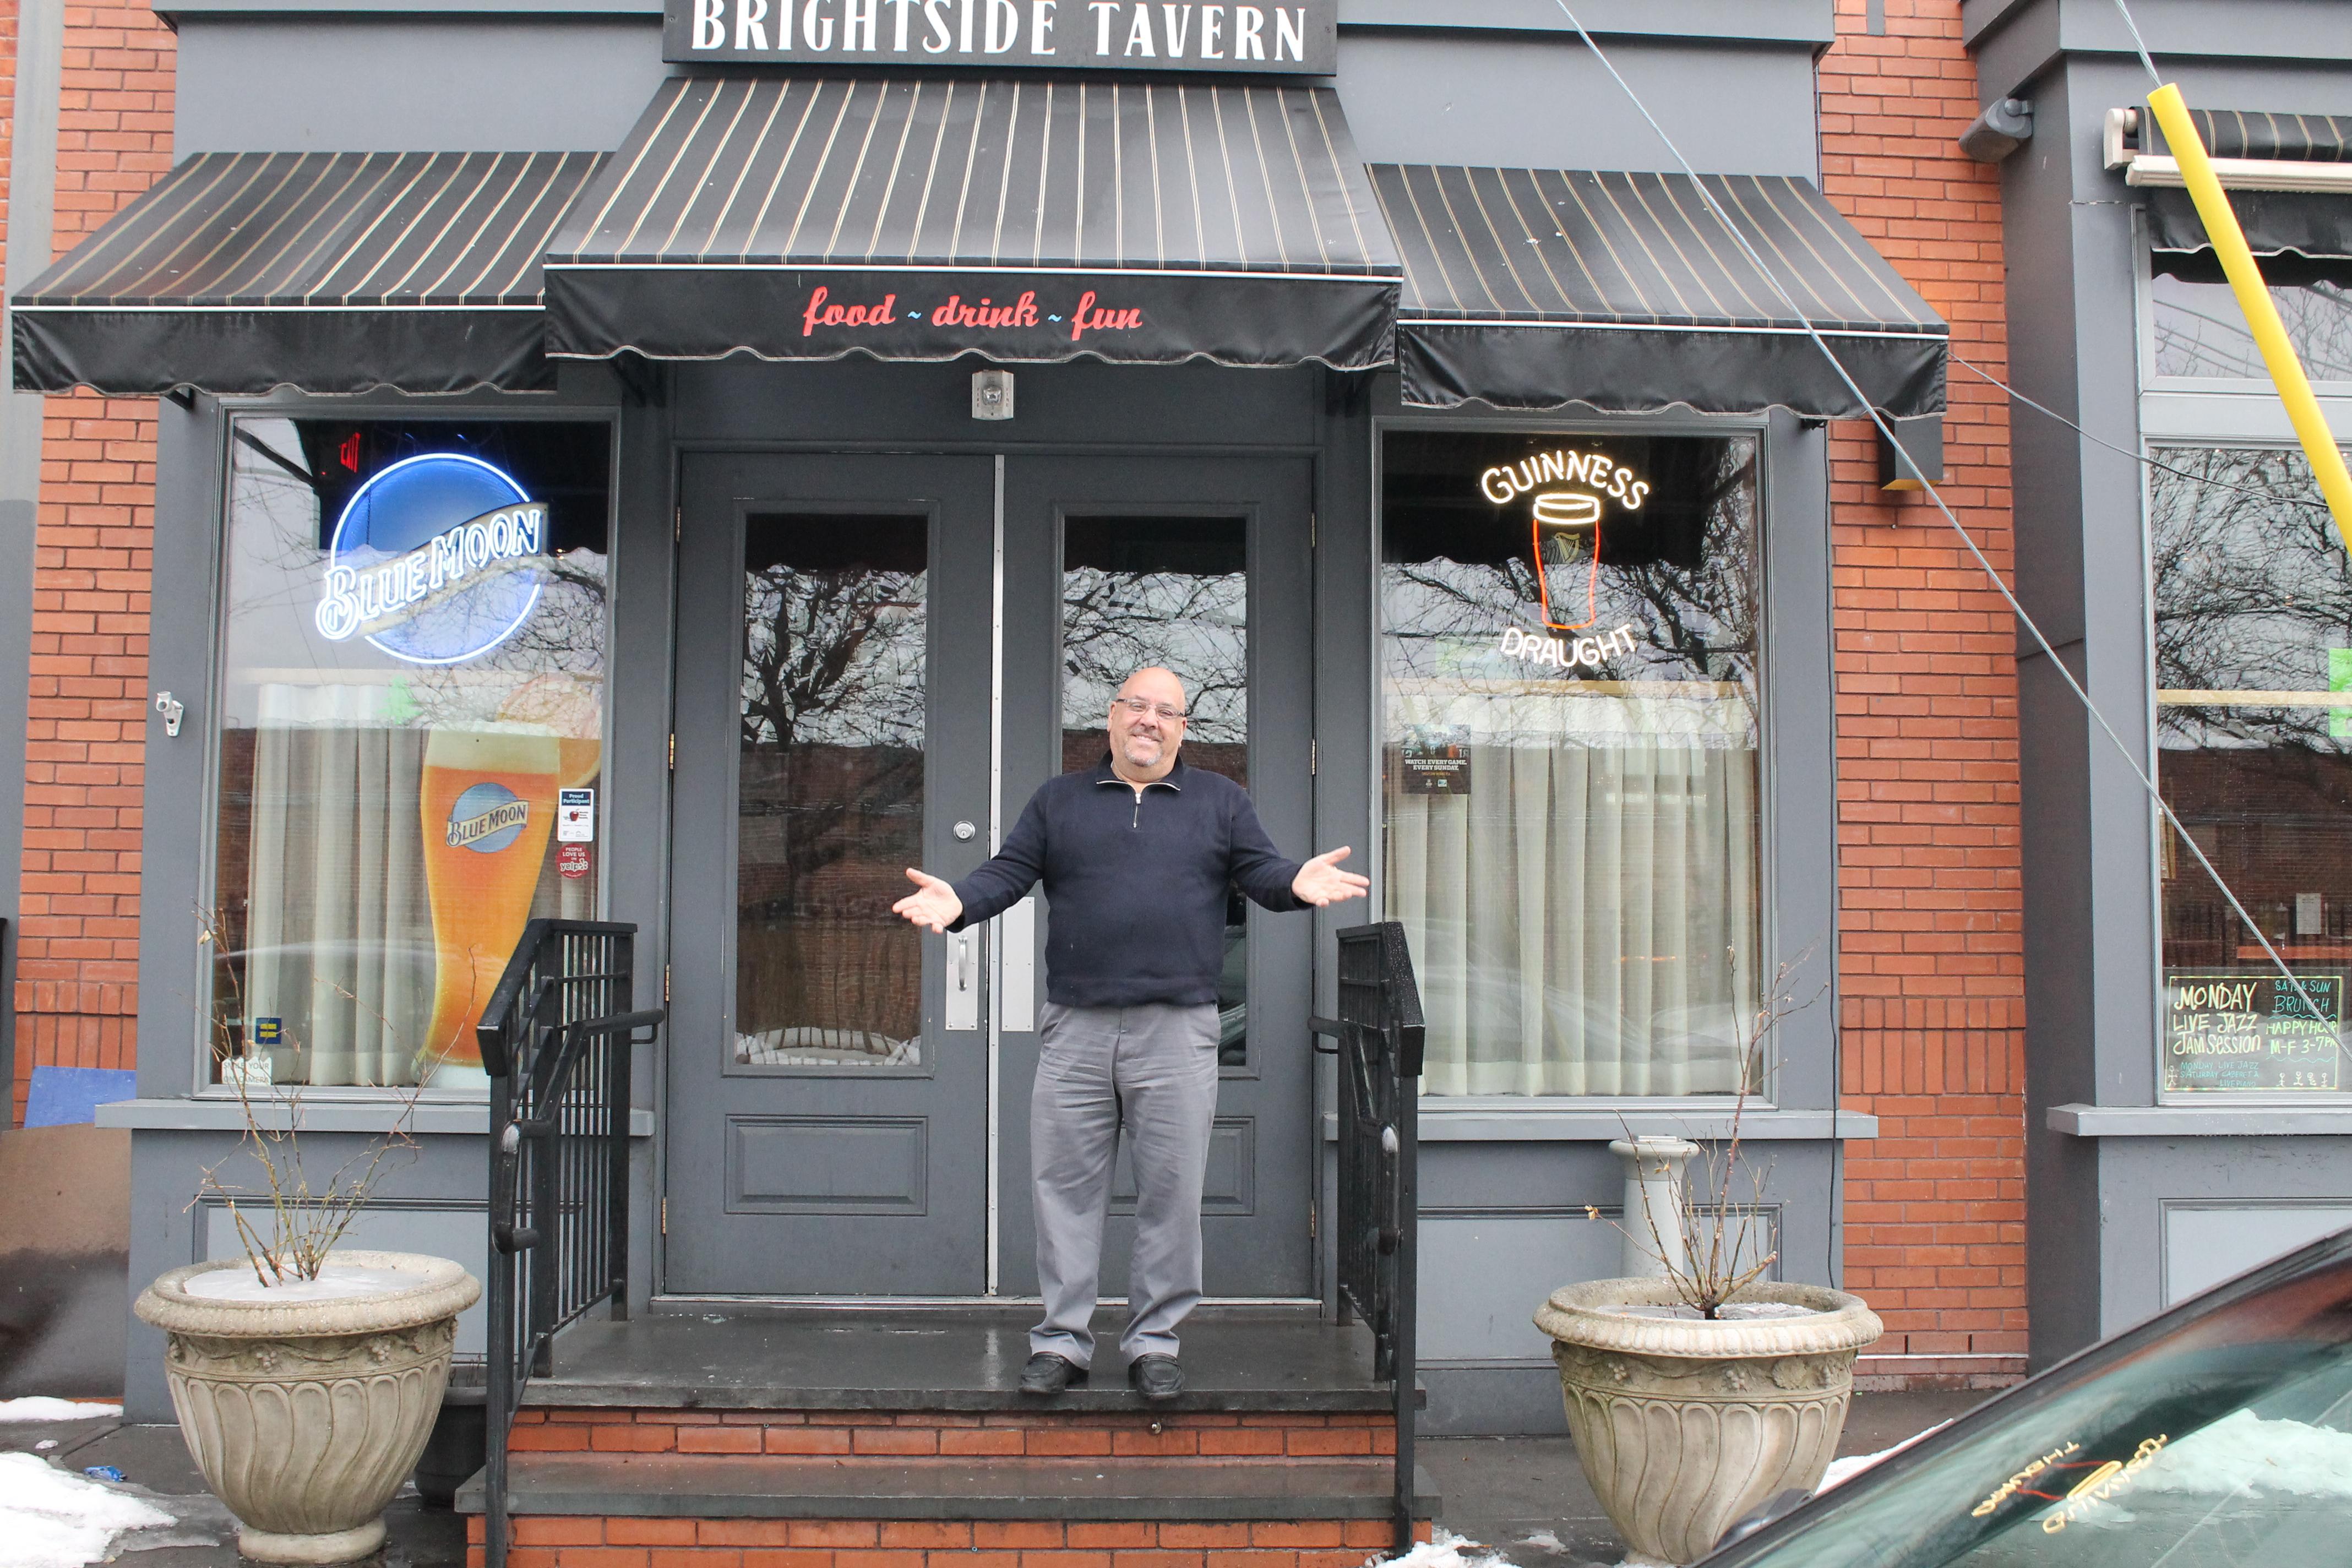 The brightside tavern jersey city